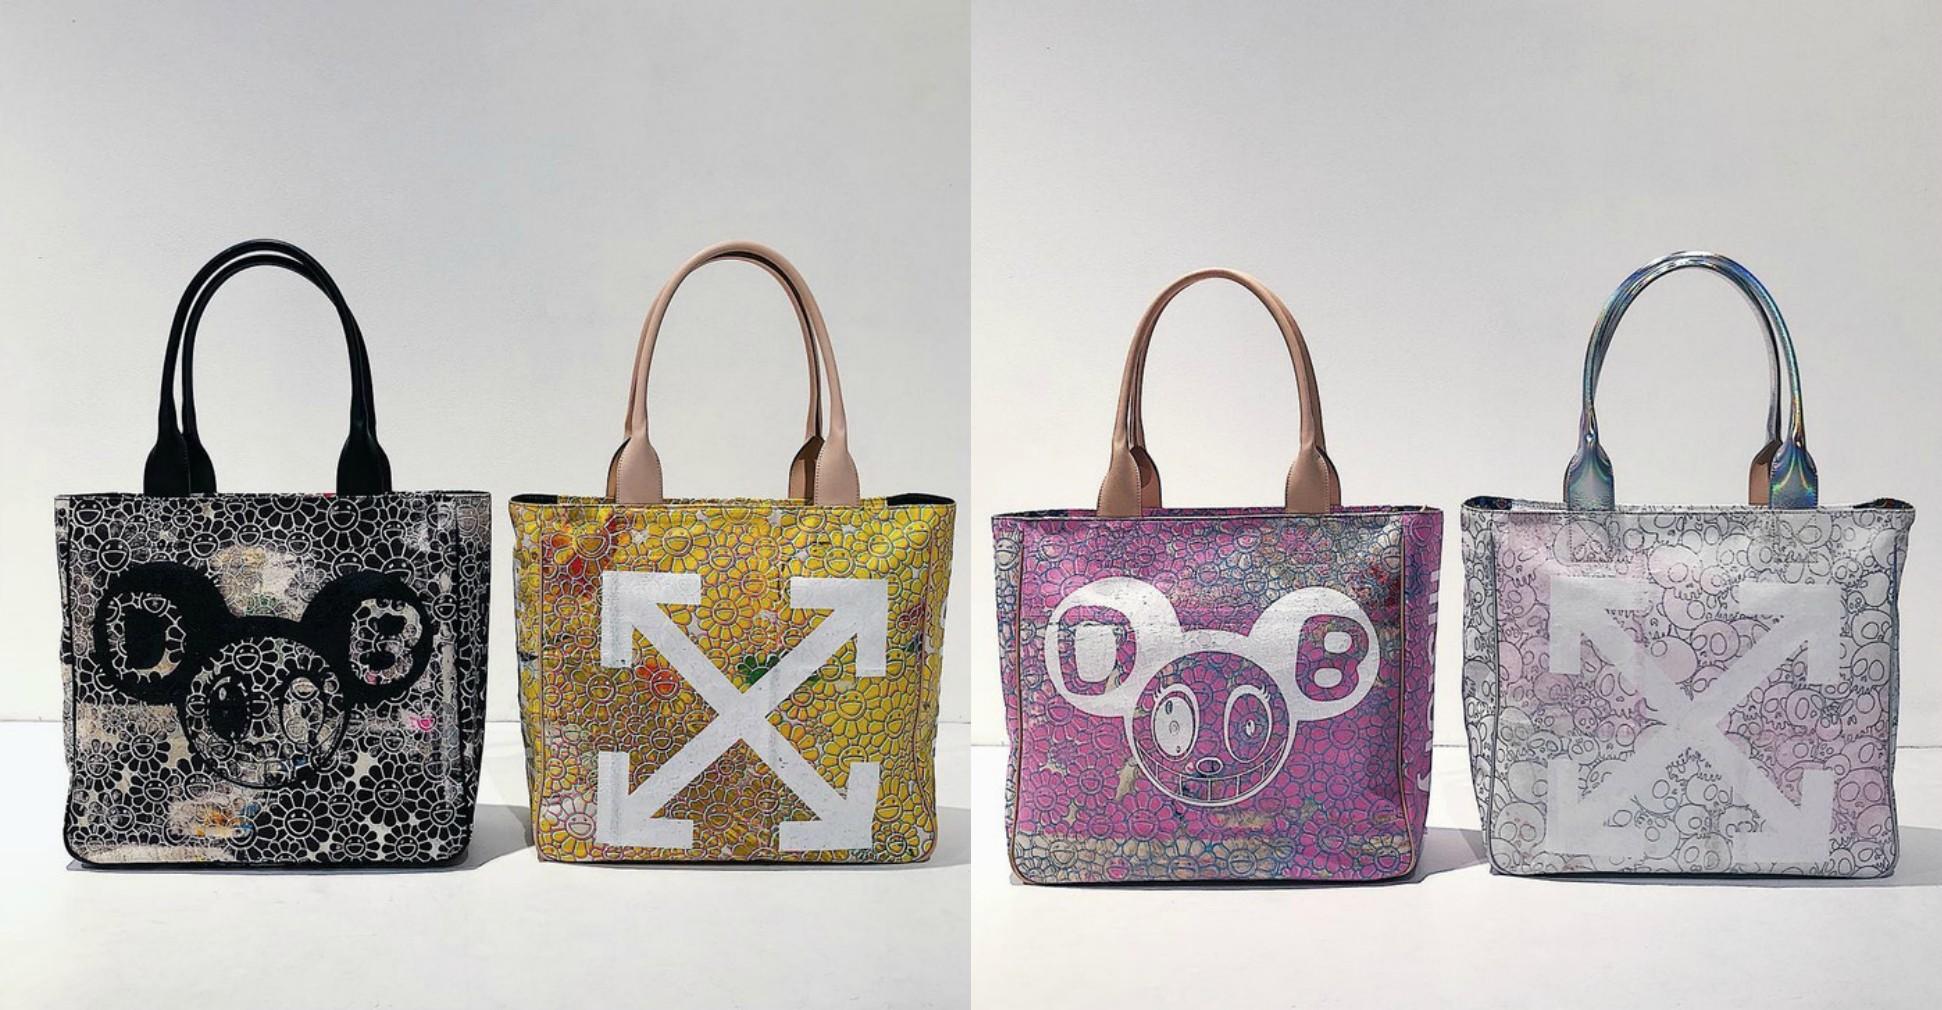 Off-White и Такаси Мураками создали коллекцию сумок 5468e5c1308